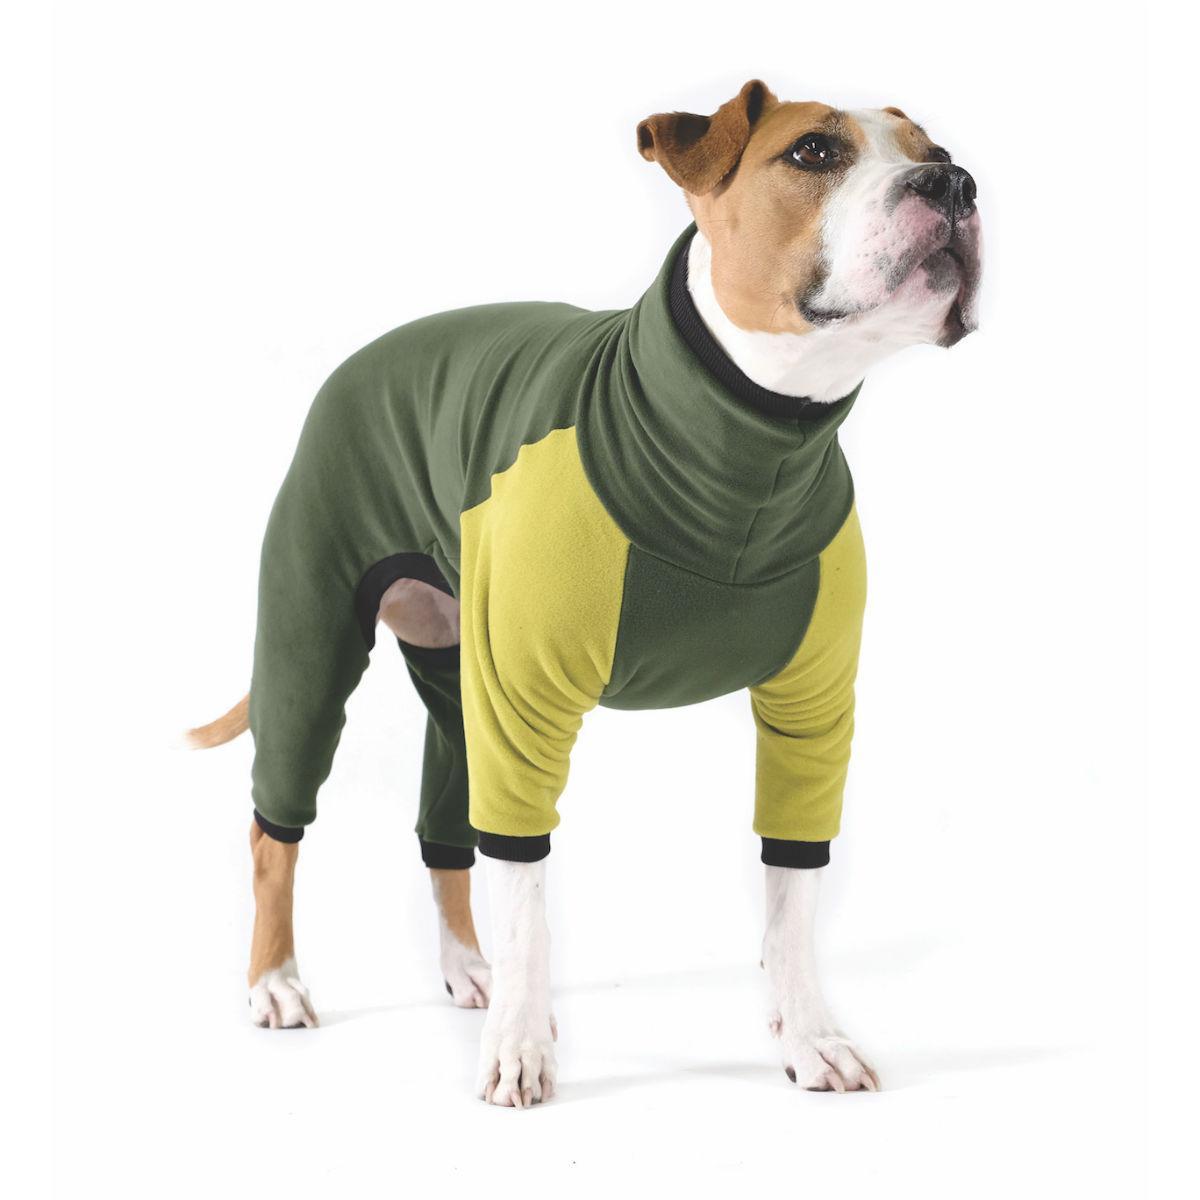 Gold Paw Stretch Fleece Dog Onesie - Hunter and Avocado